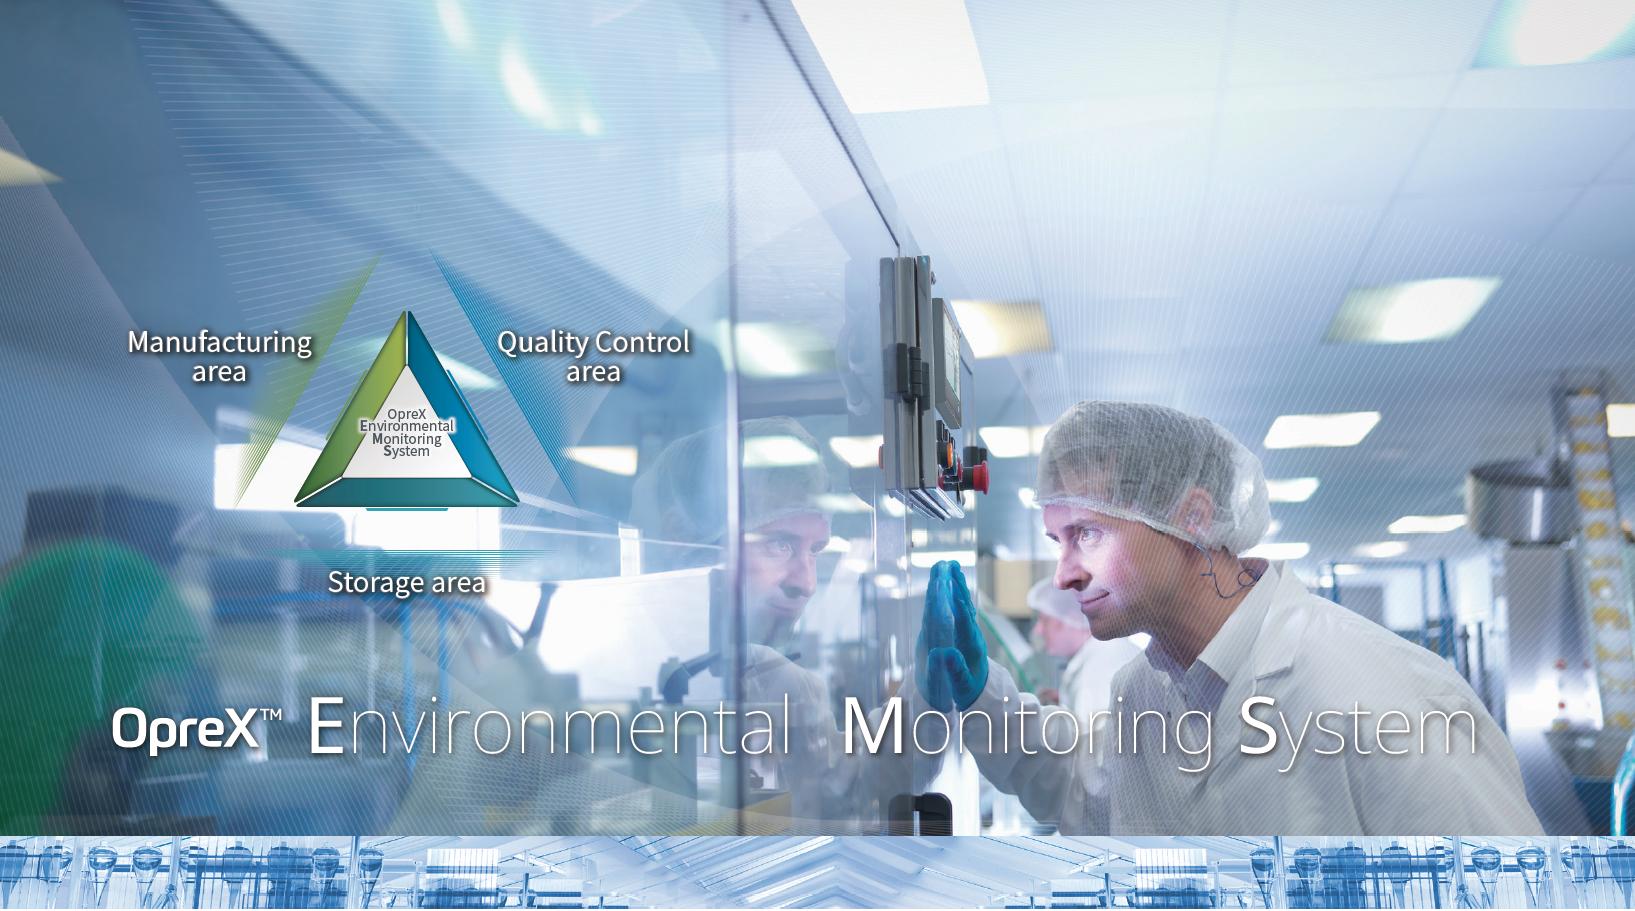 OpreX Environmental Monitoring System thumbnail